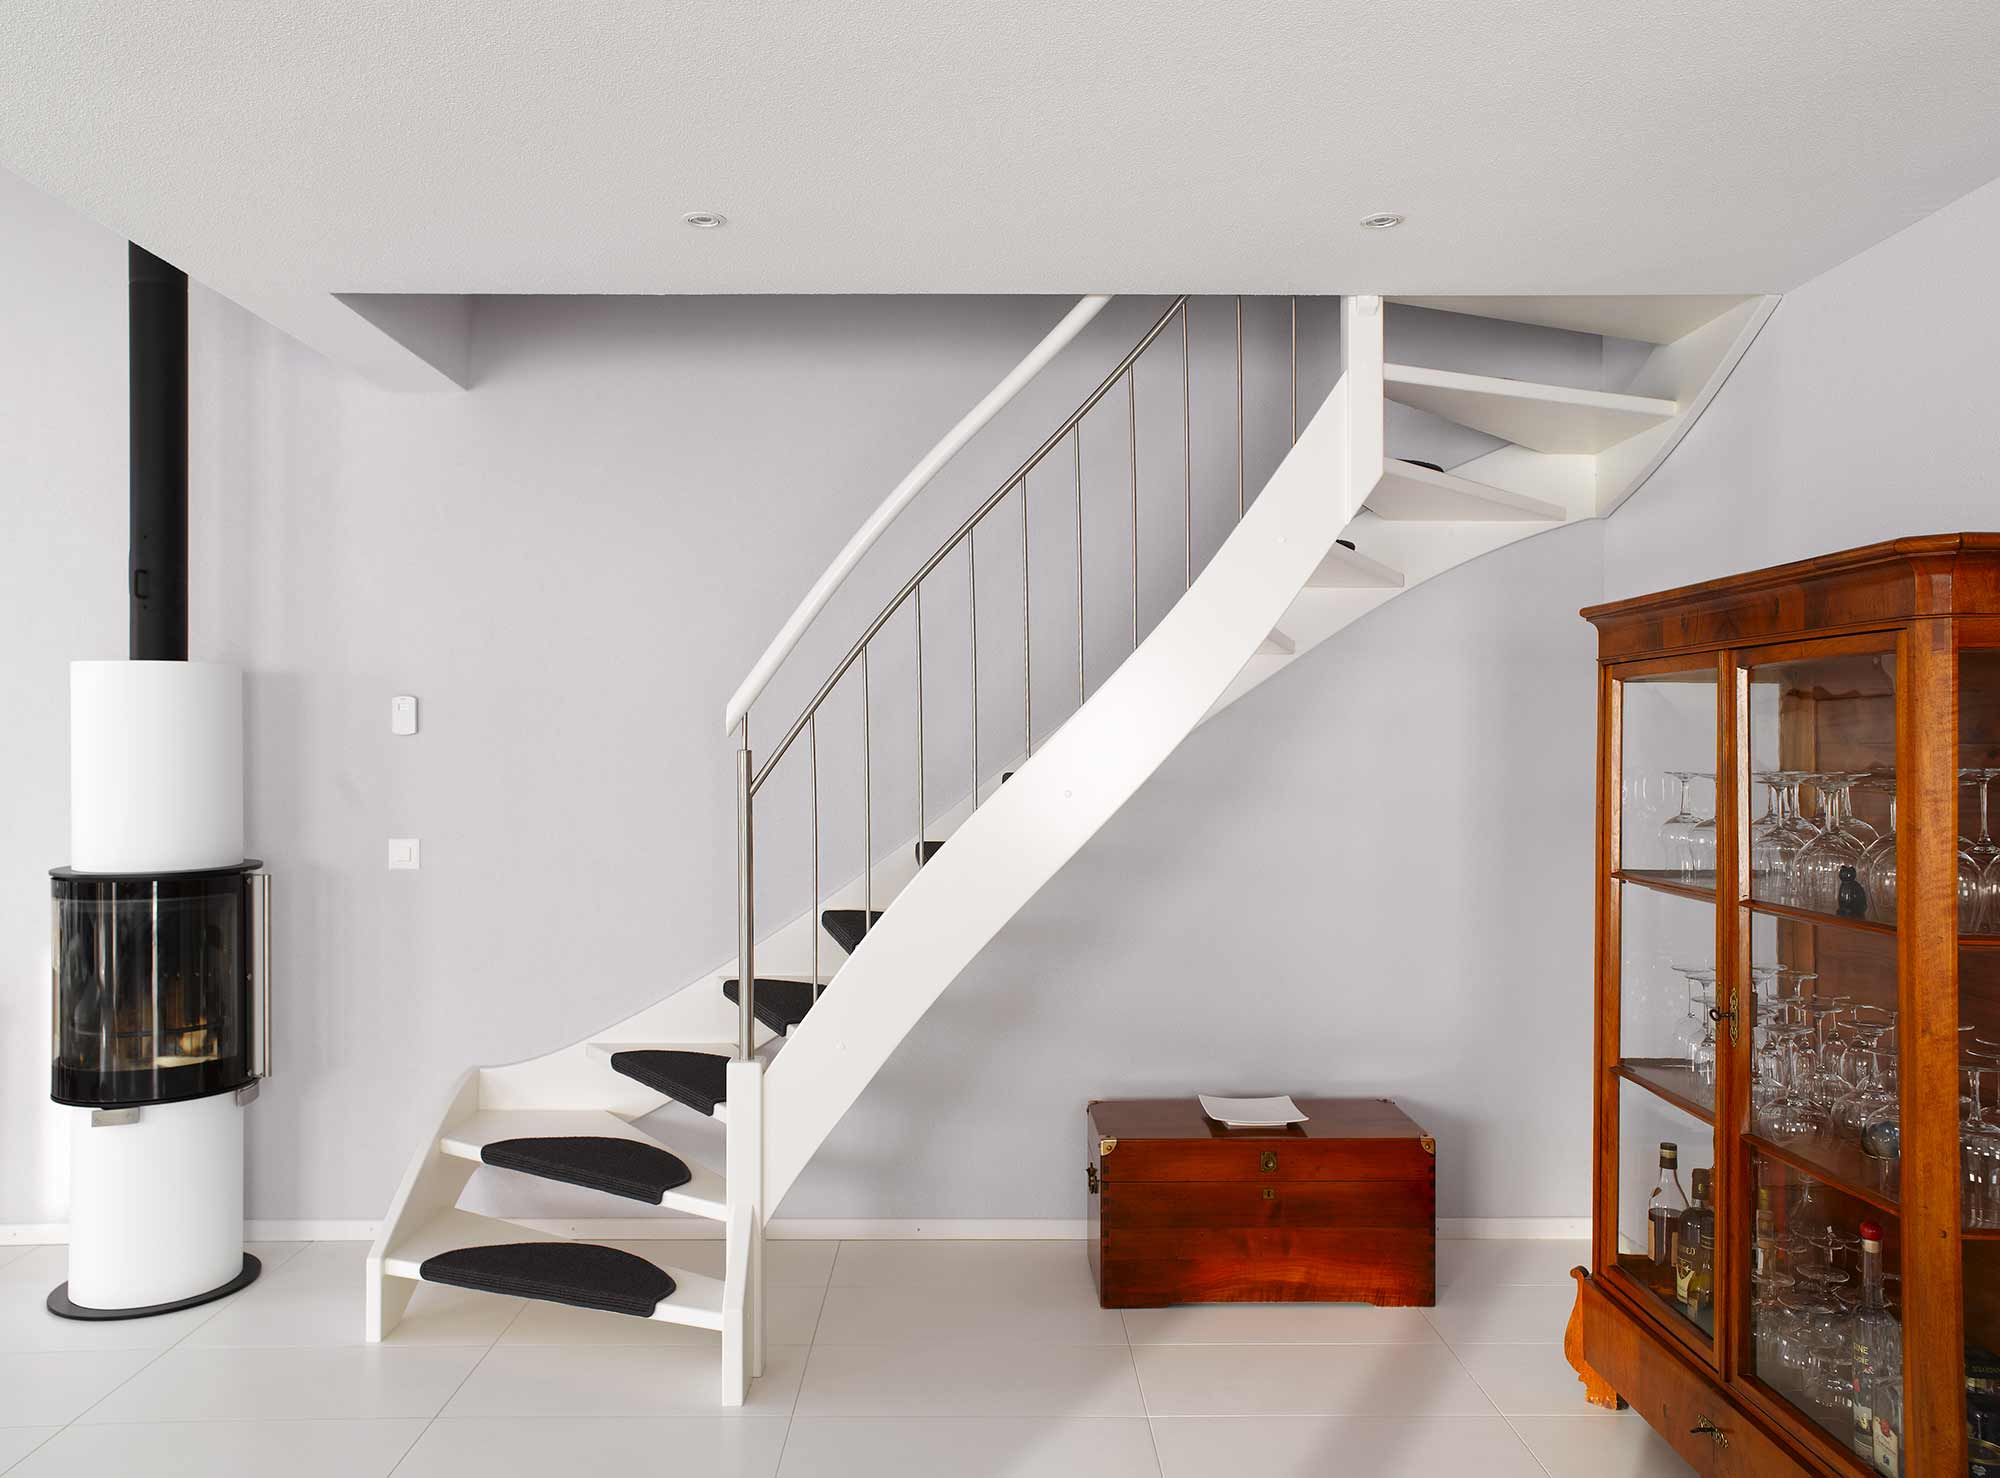 escaliers565